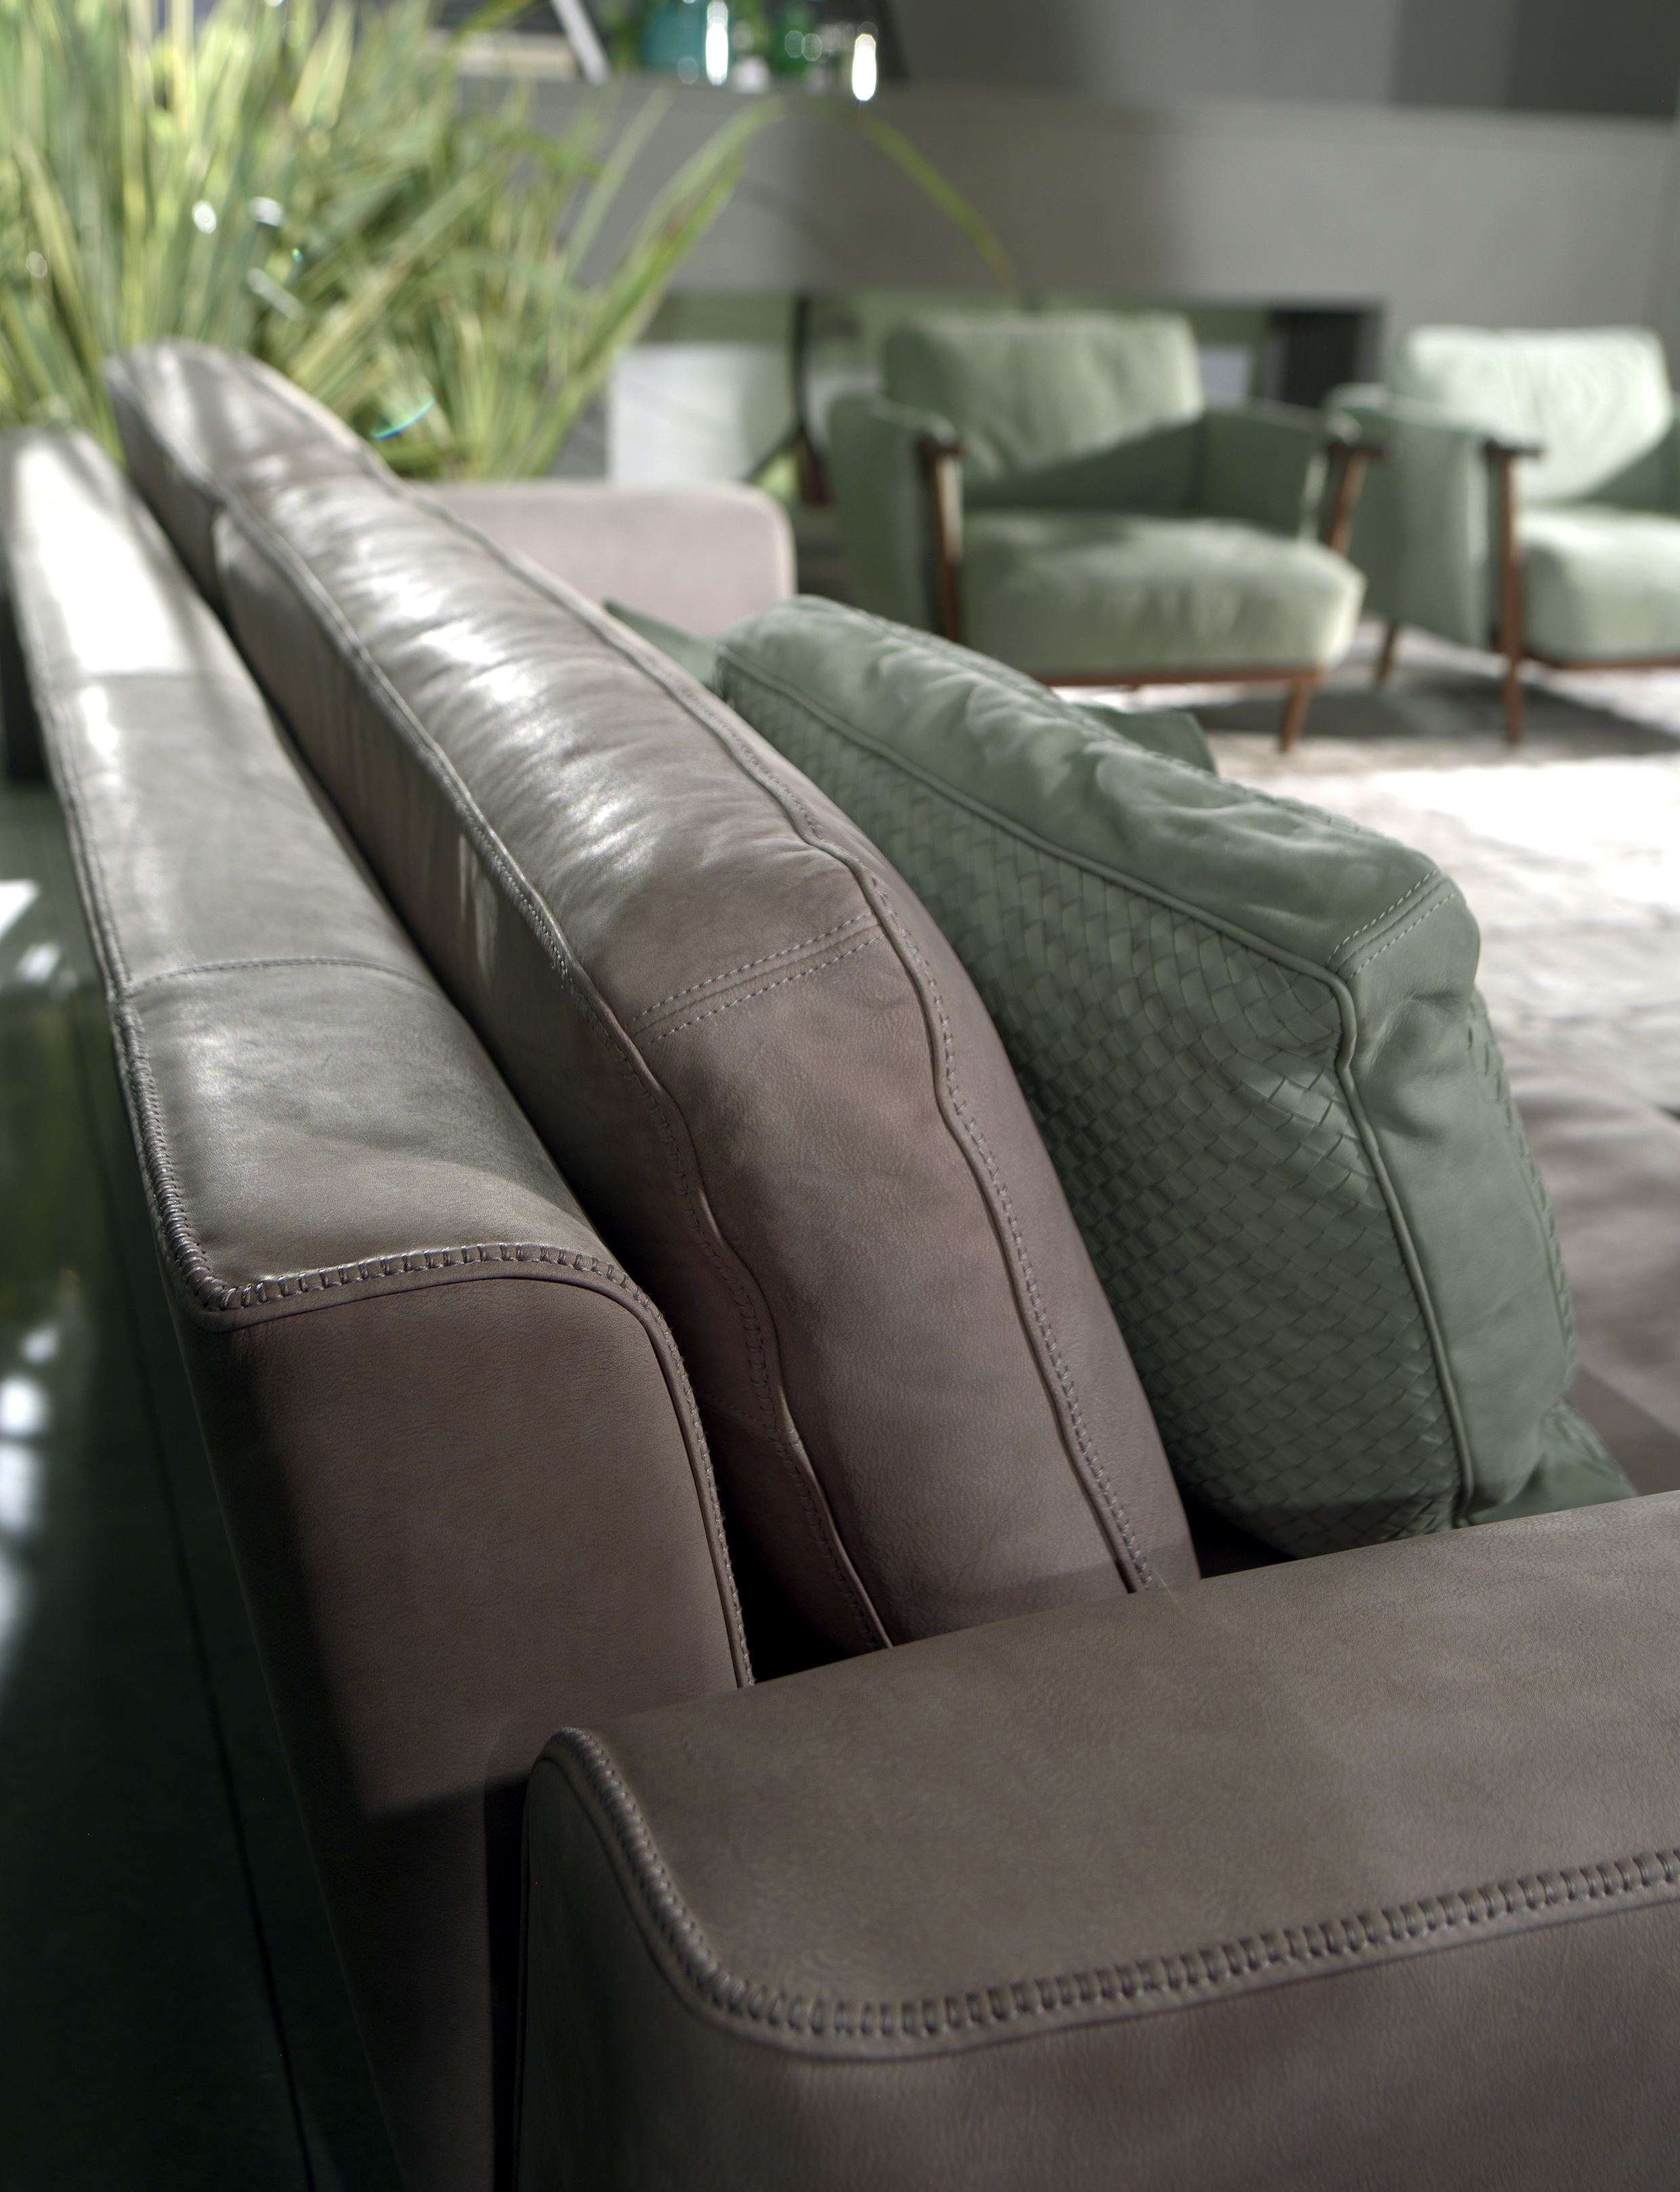 Ulivi Salotti - Robert leather sofa detail - Masha Shapiro Agency.jpg